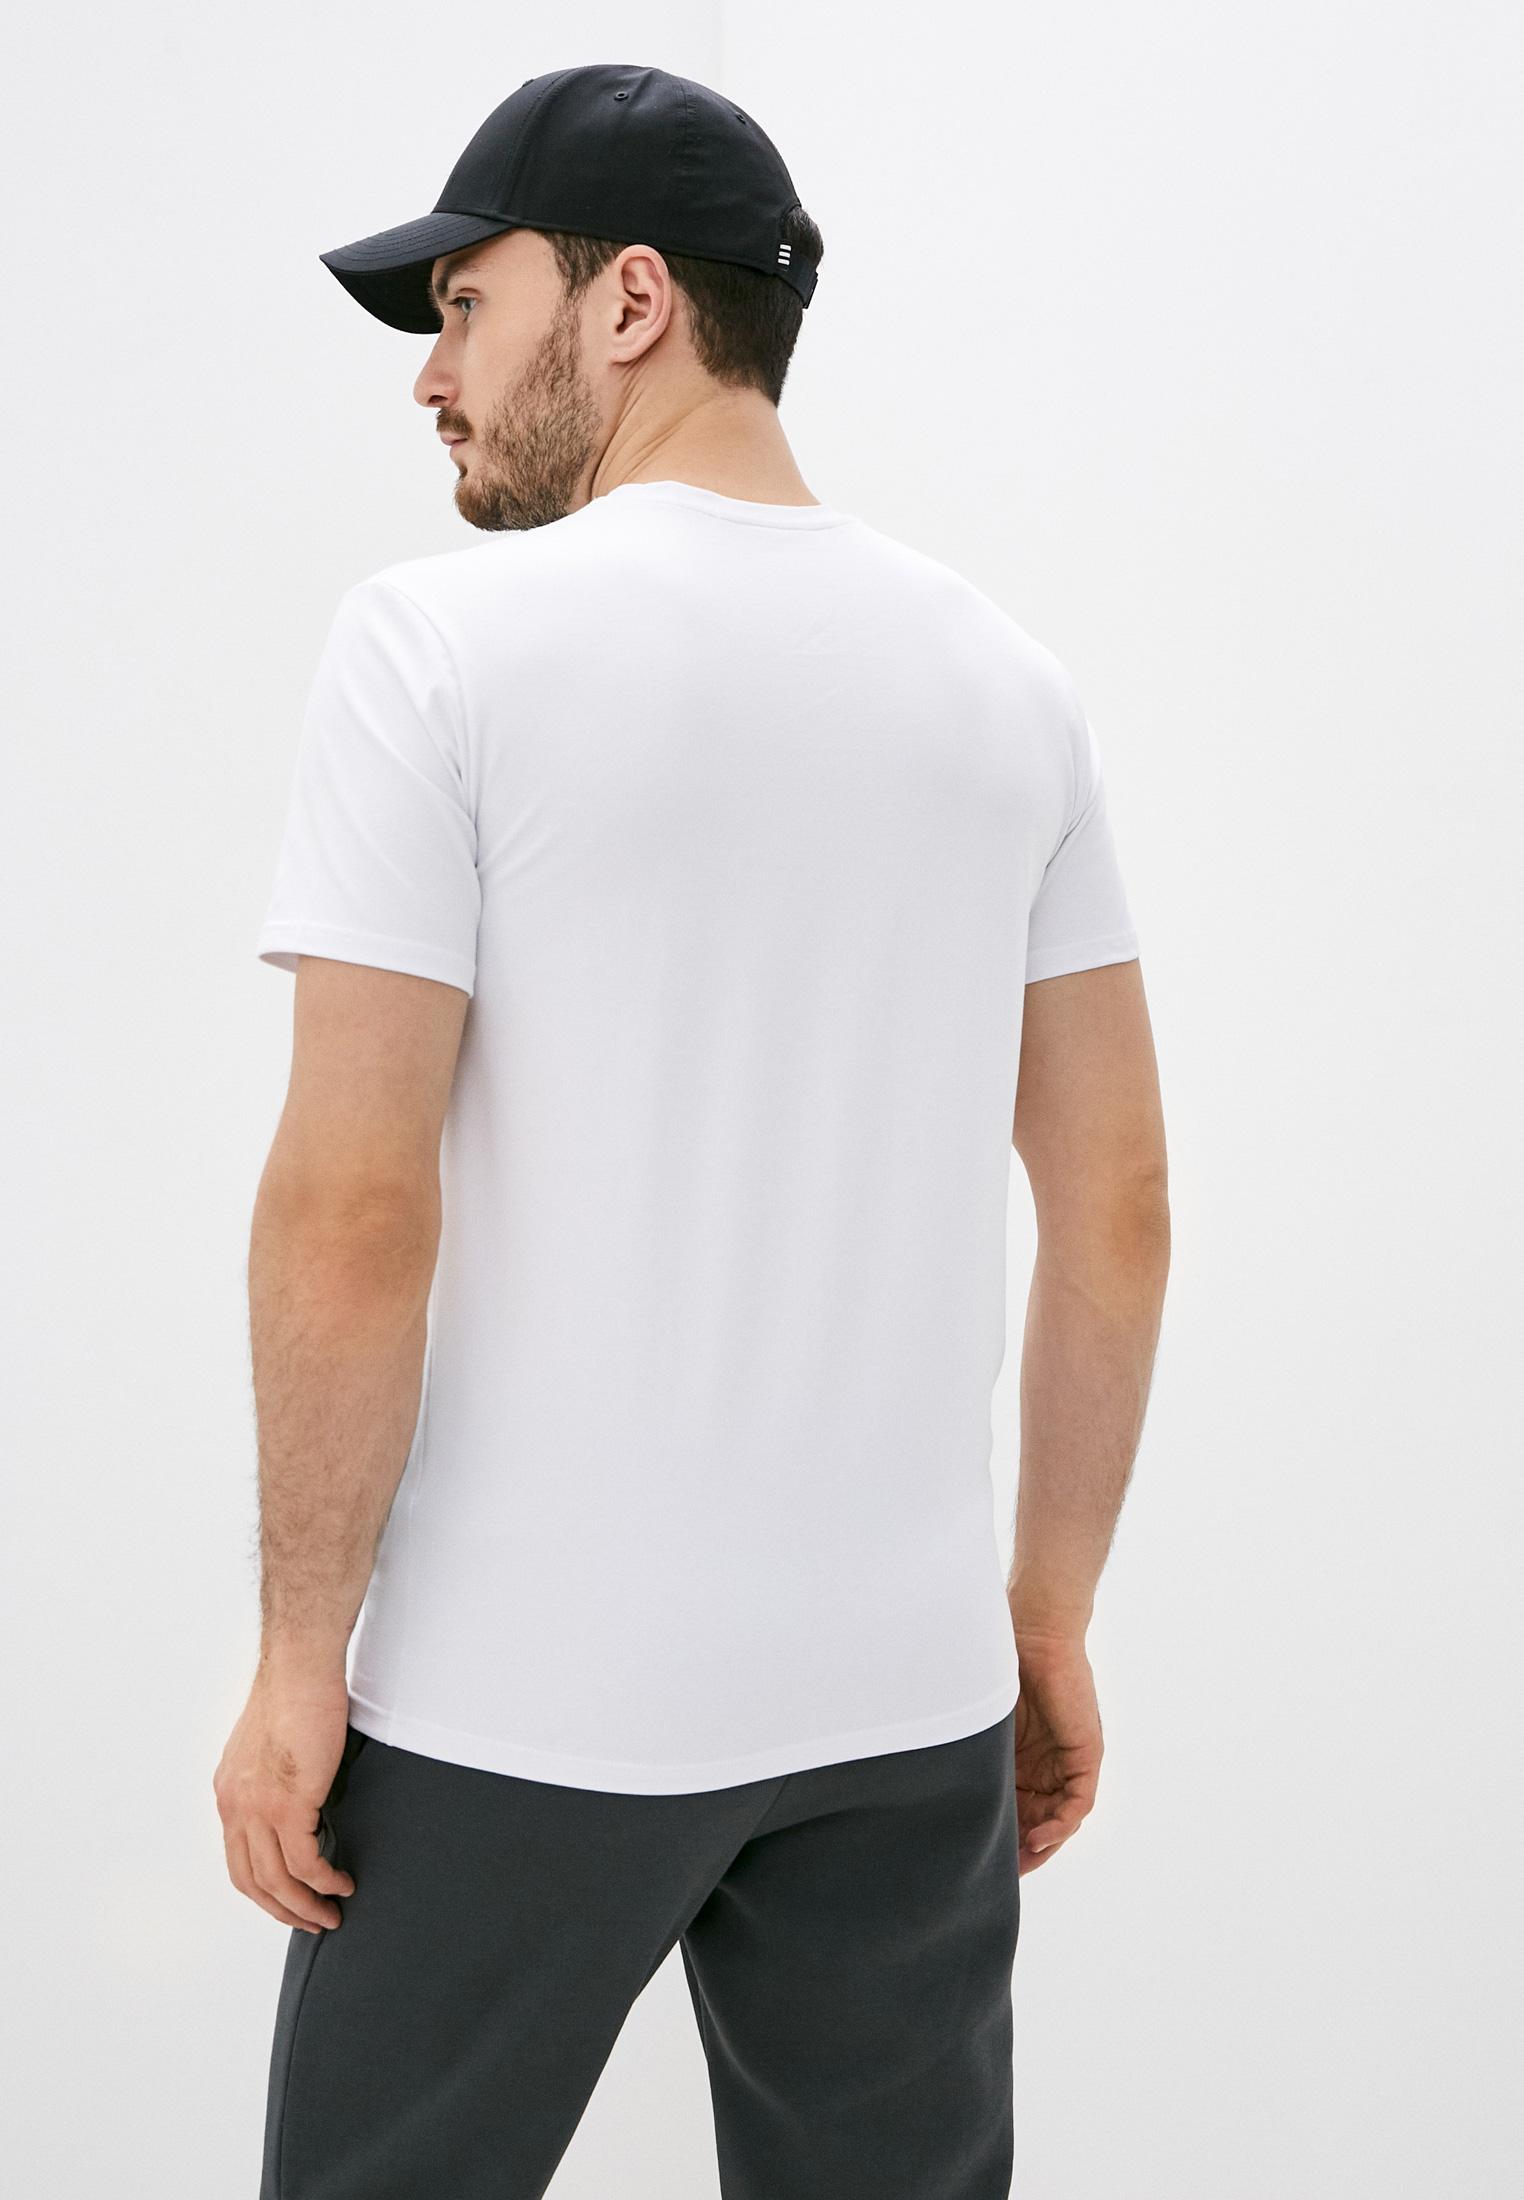 Мужская футболка Baldinini (Балдинини) TSU04111: изображение 4